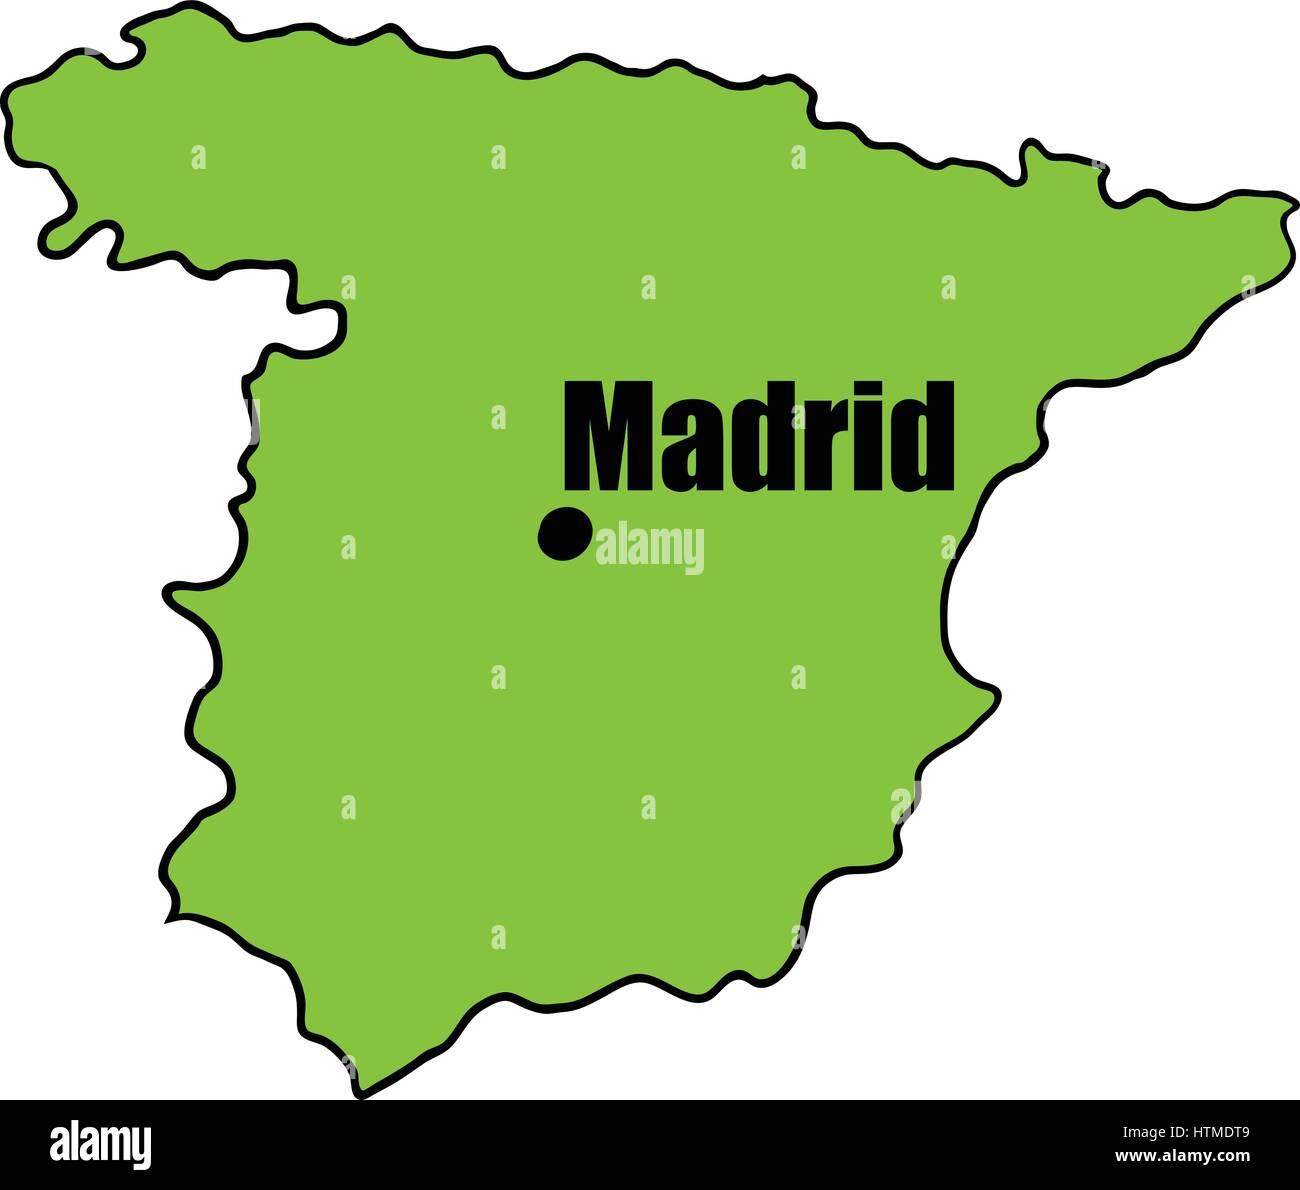 Spanische Karte.Spanische Karte Stockfotos Spanische Karte Bilder Alamy